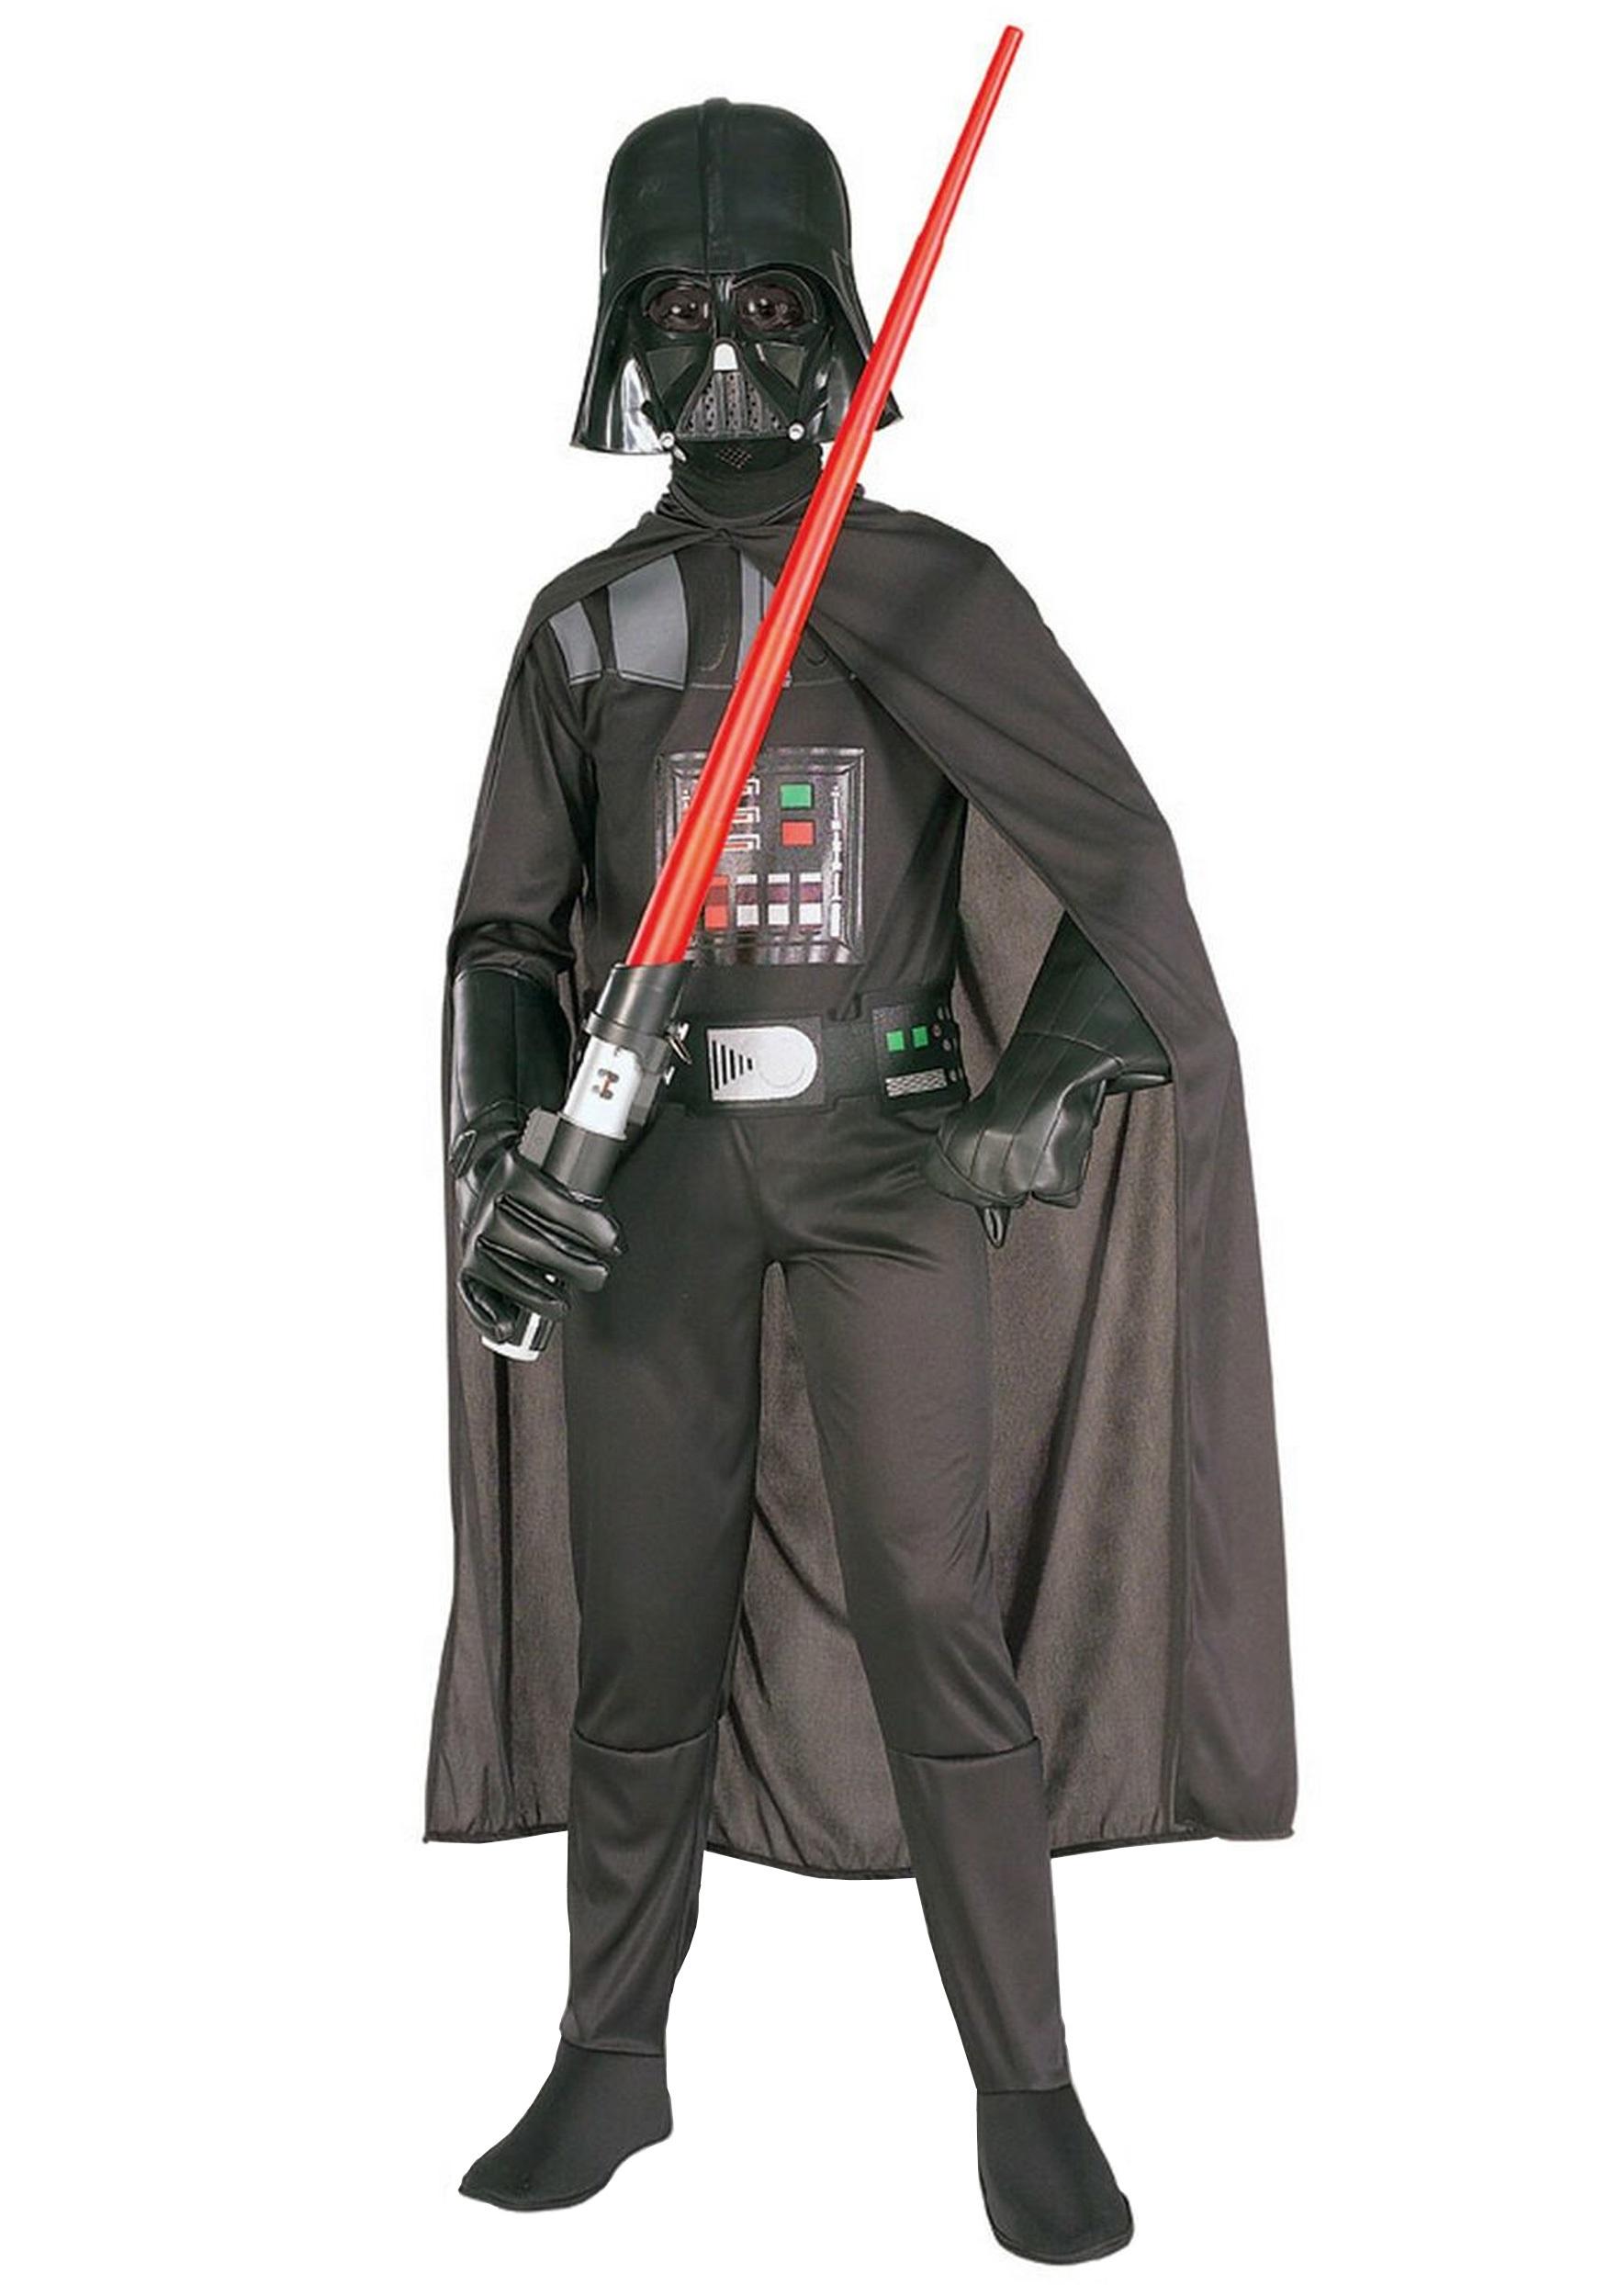 Kids Darth Vader Costume RU882009